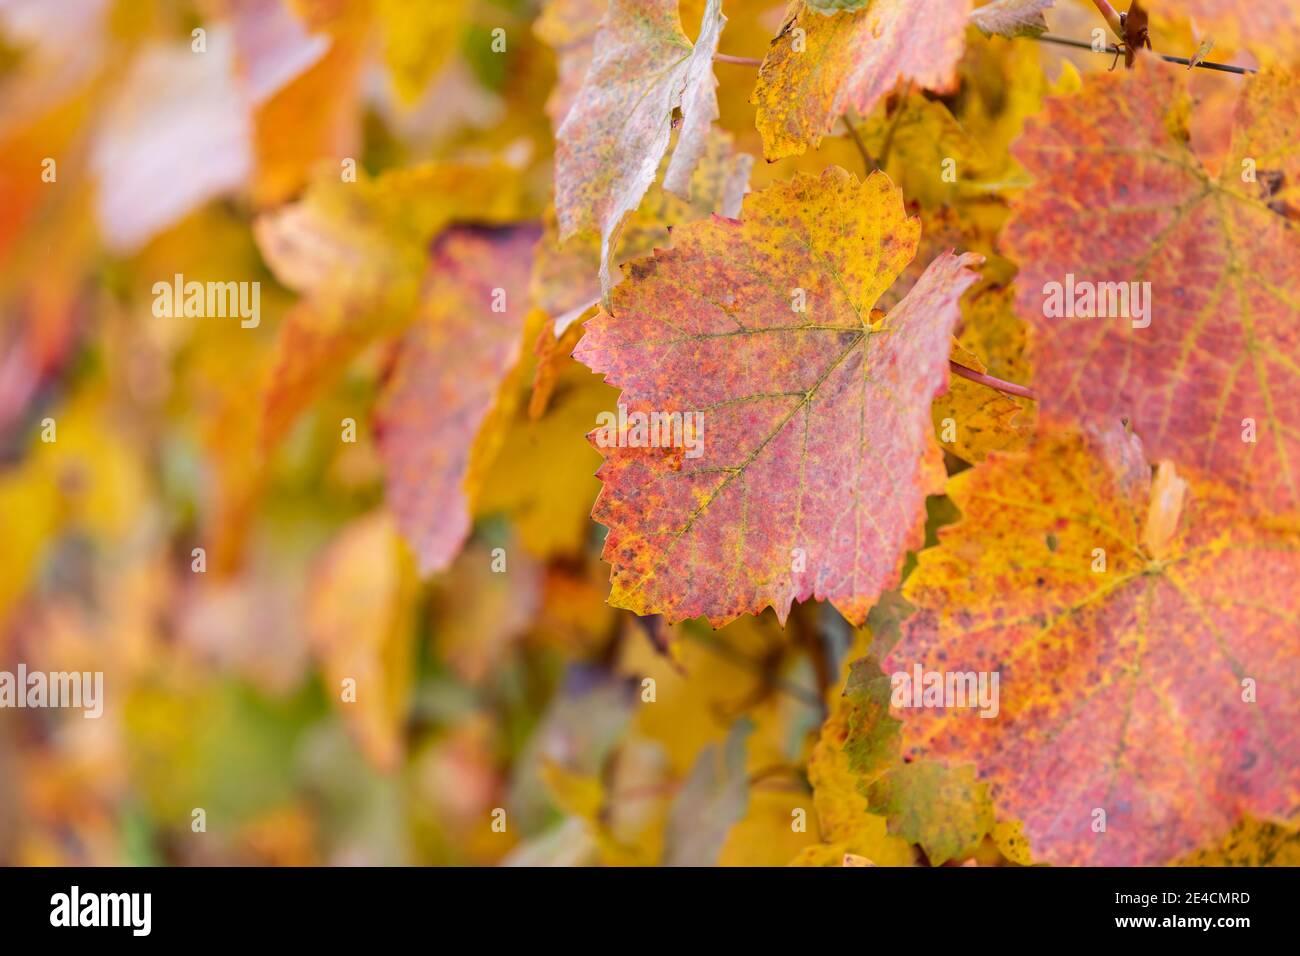 Europe, Germany, Baden-Wuerttemberg, Stromberg Heuchelberg Nature Park, Hohenhaslach, vineyard, vine with autumn leaves Stock Photo